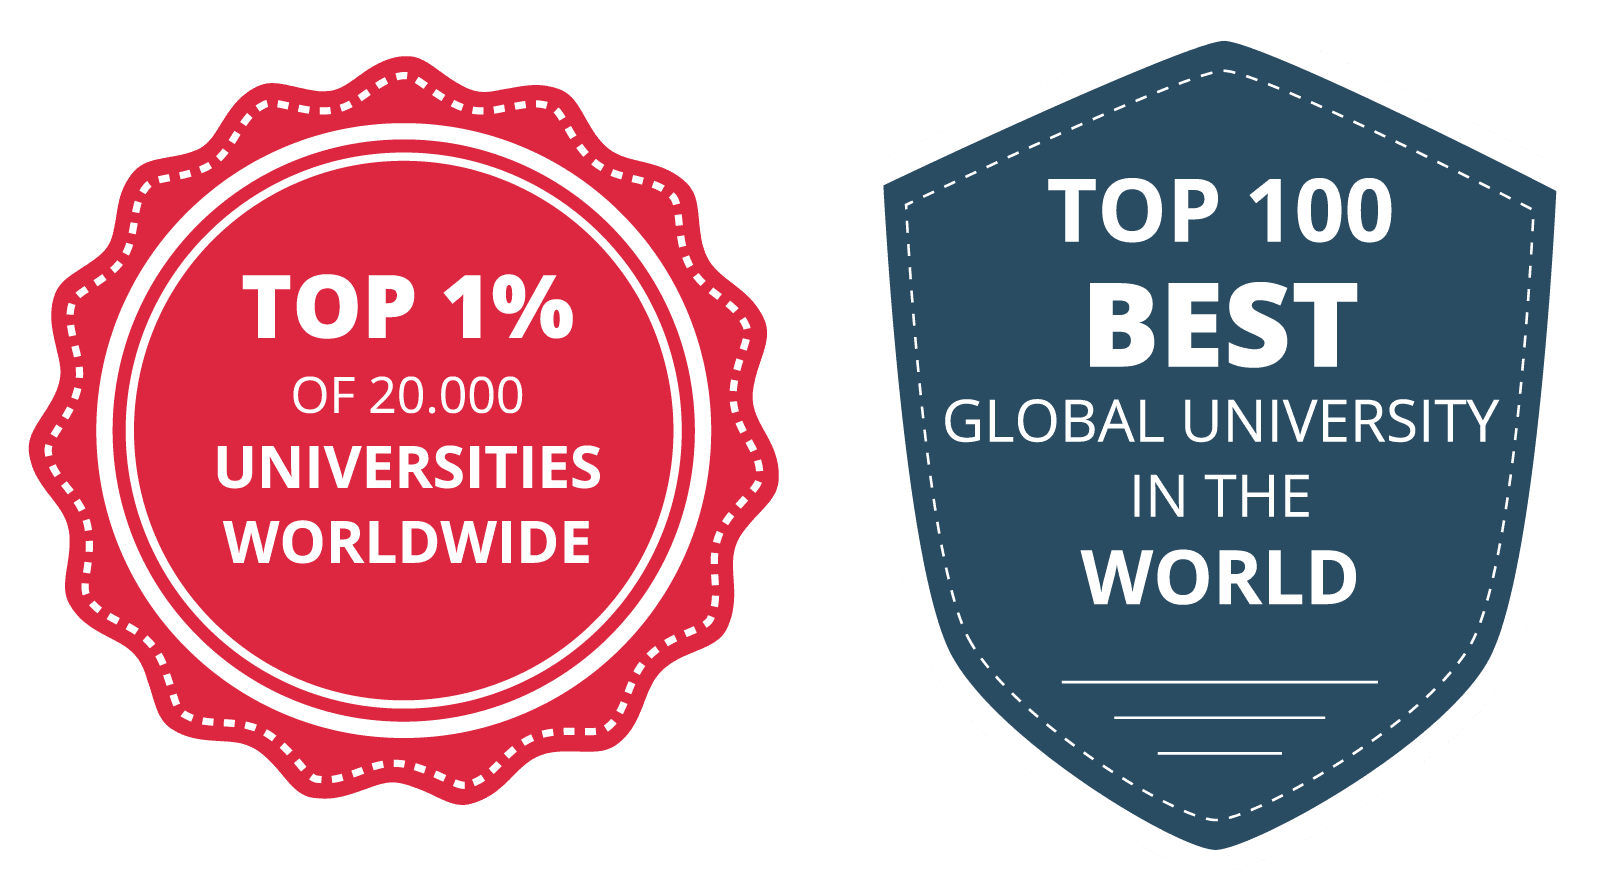 Best Global University in the world